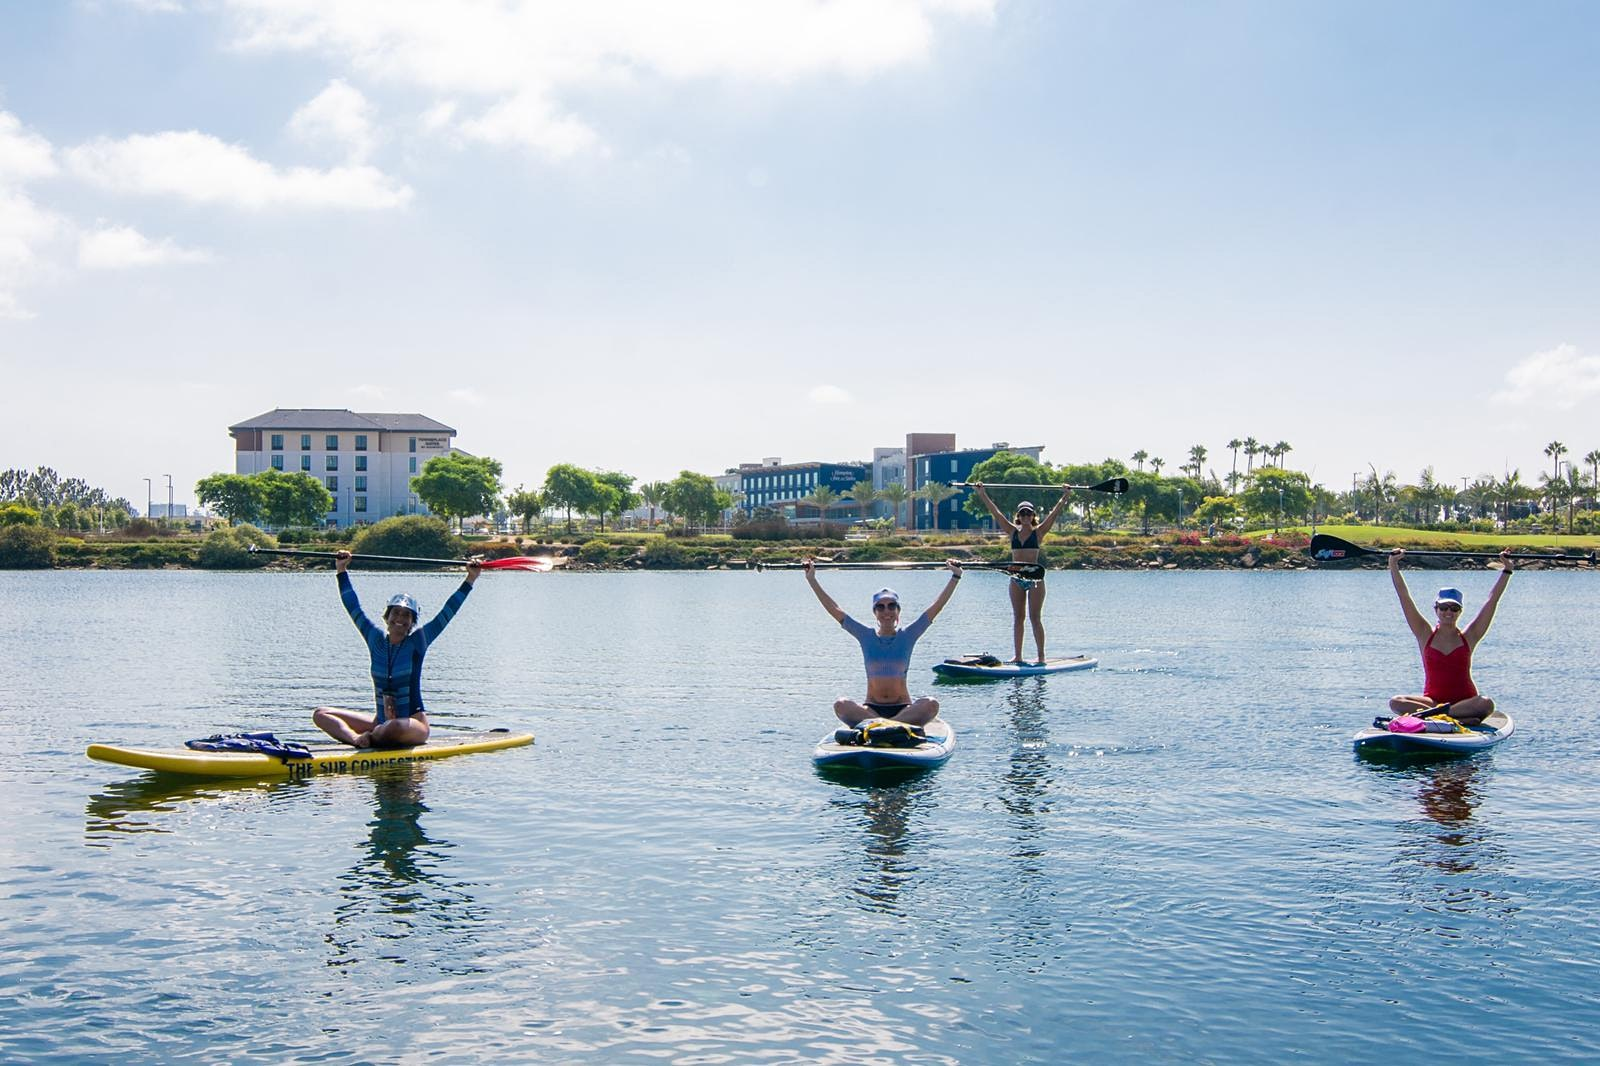 SUP Yoga (Stand Up Paddleboard Yoga)